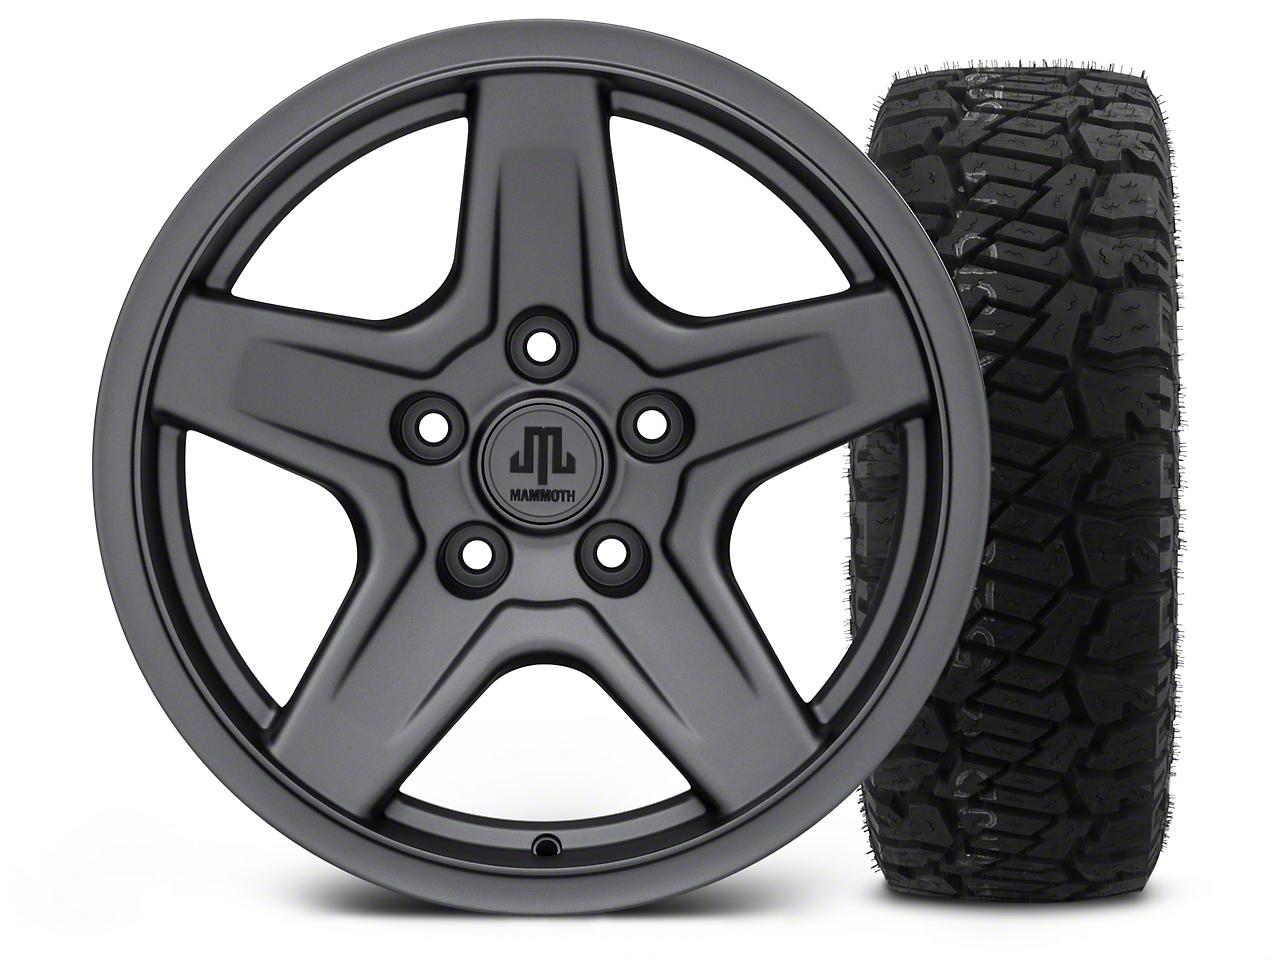 Mammoth Boulder Charcoal - 17x9 Wheel - and Dick Cepek Fun Country Tire - 315/70R17 (07-18 Jeep Wrangler JK; 2018 Jeep Wrangler JL)